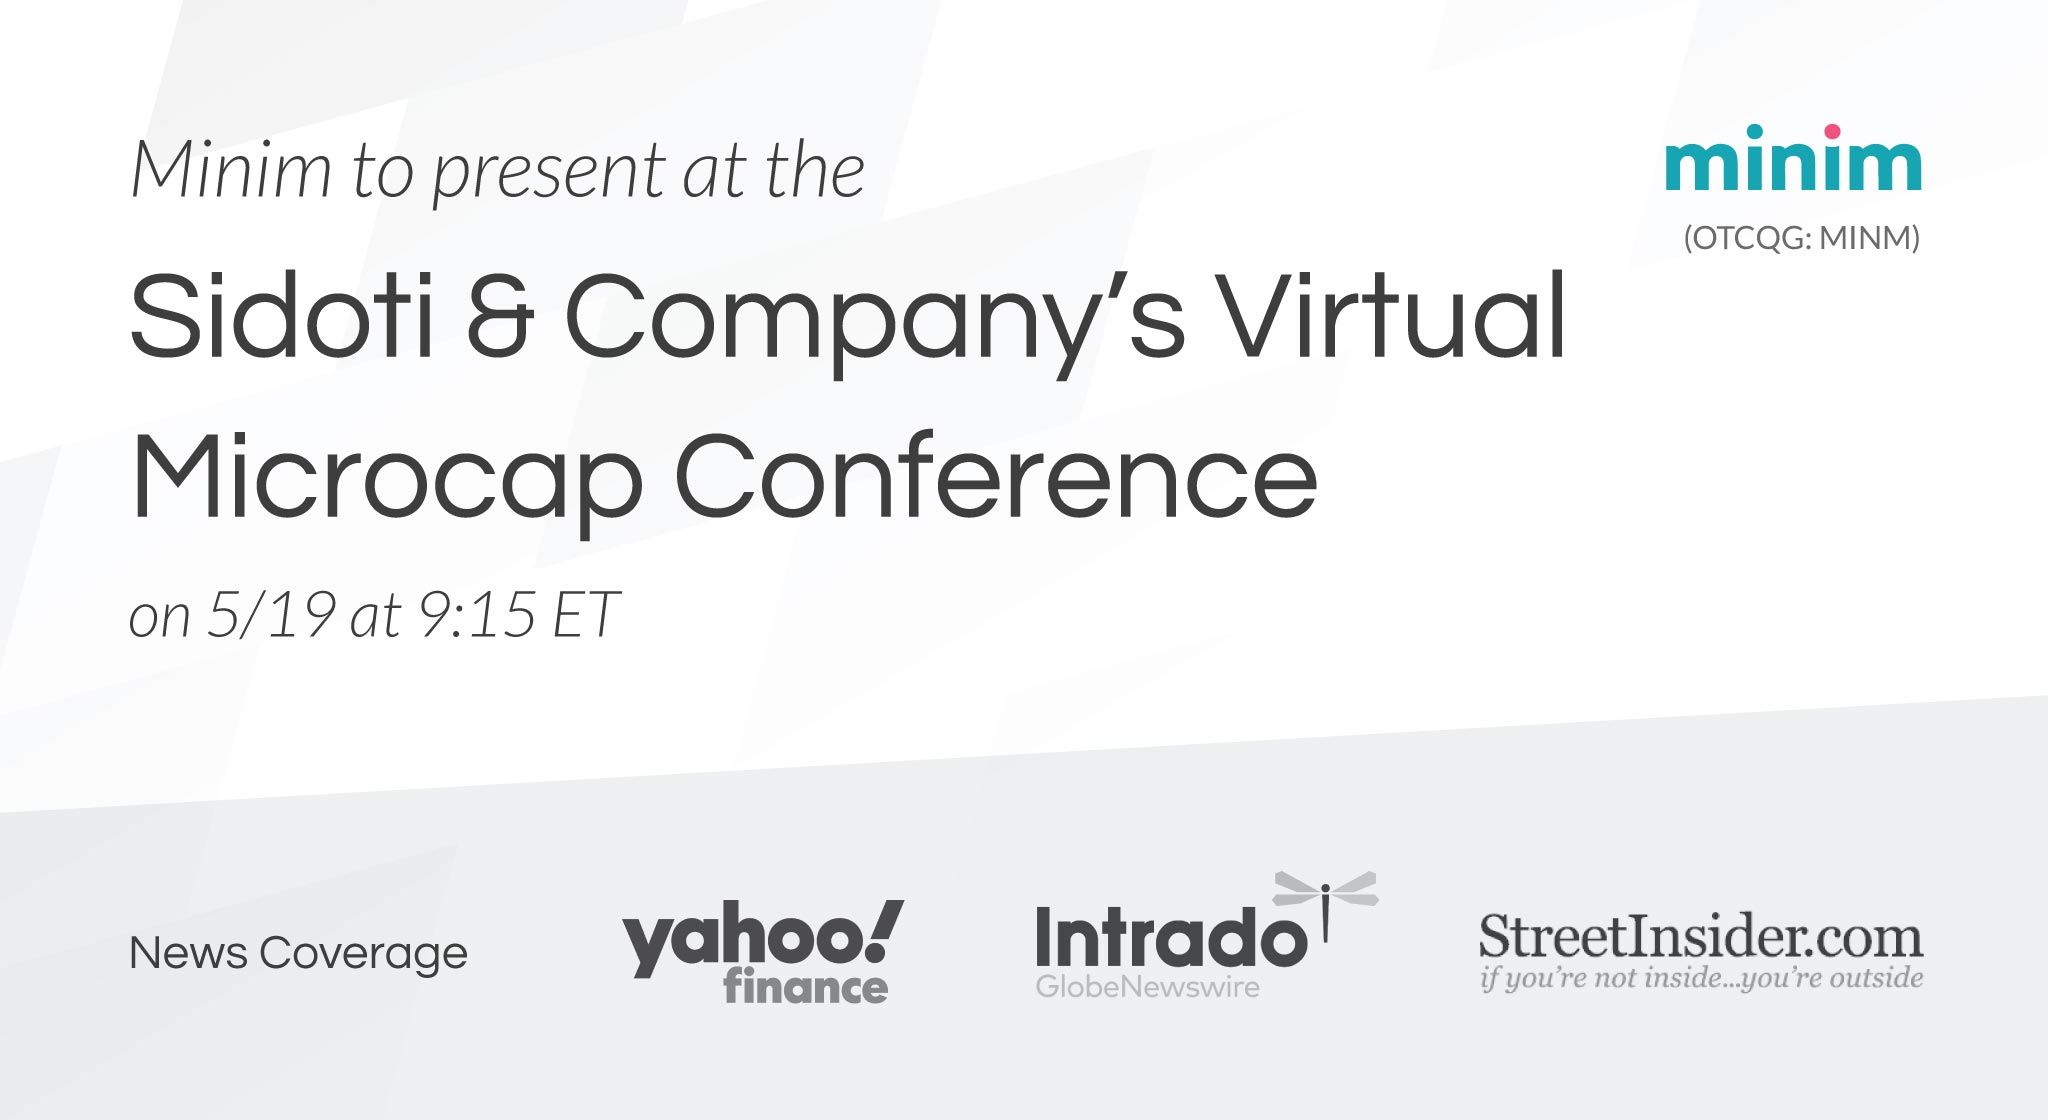 Minim to present at Sidoti and Company's Virtual Microcap Conference